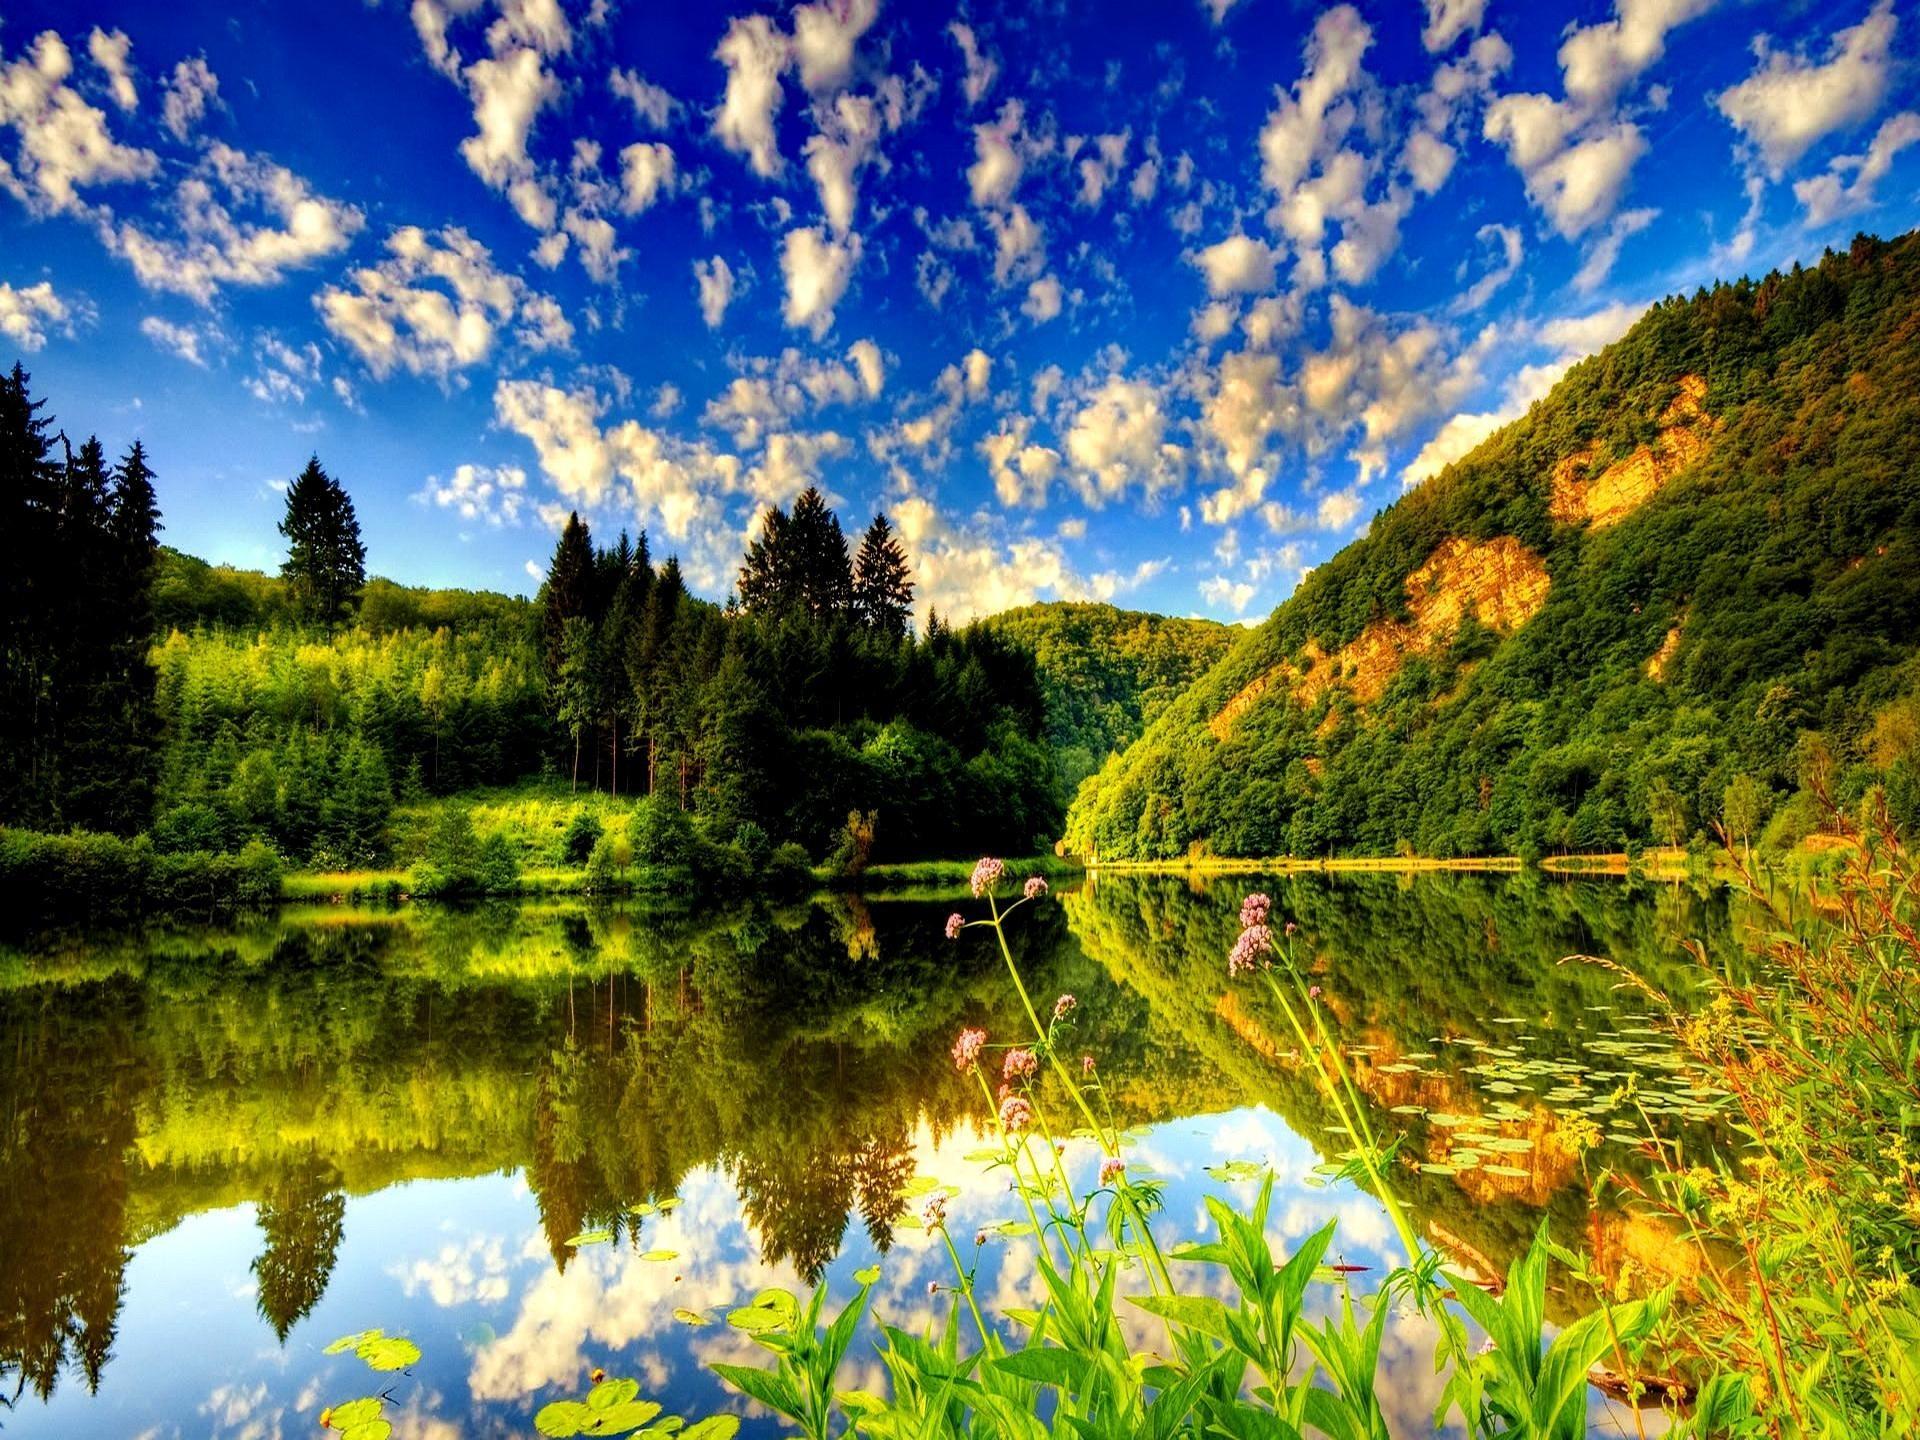 1920x1440 Summer Nature Wallpaper Desktop Background Download 1920x1080